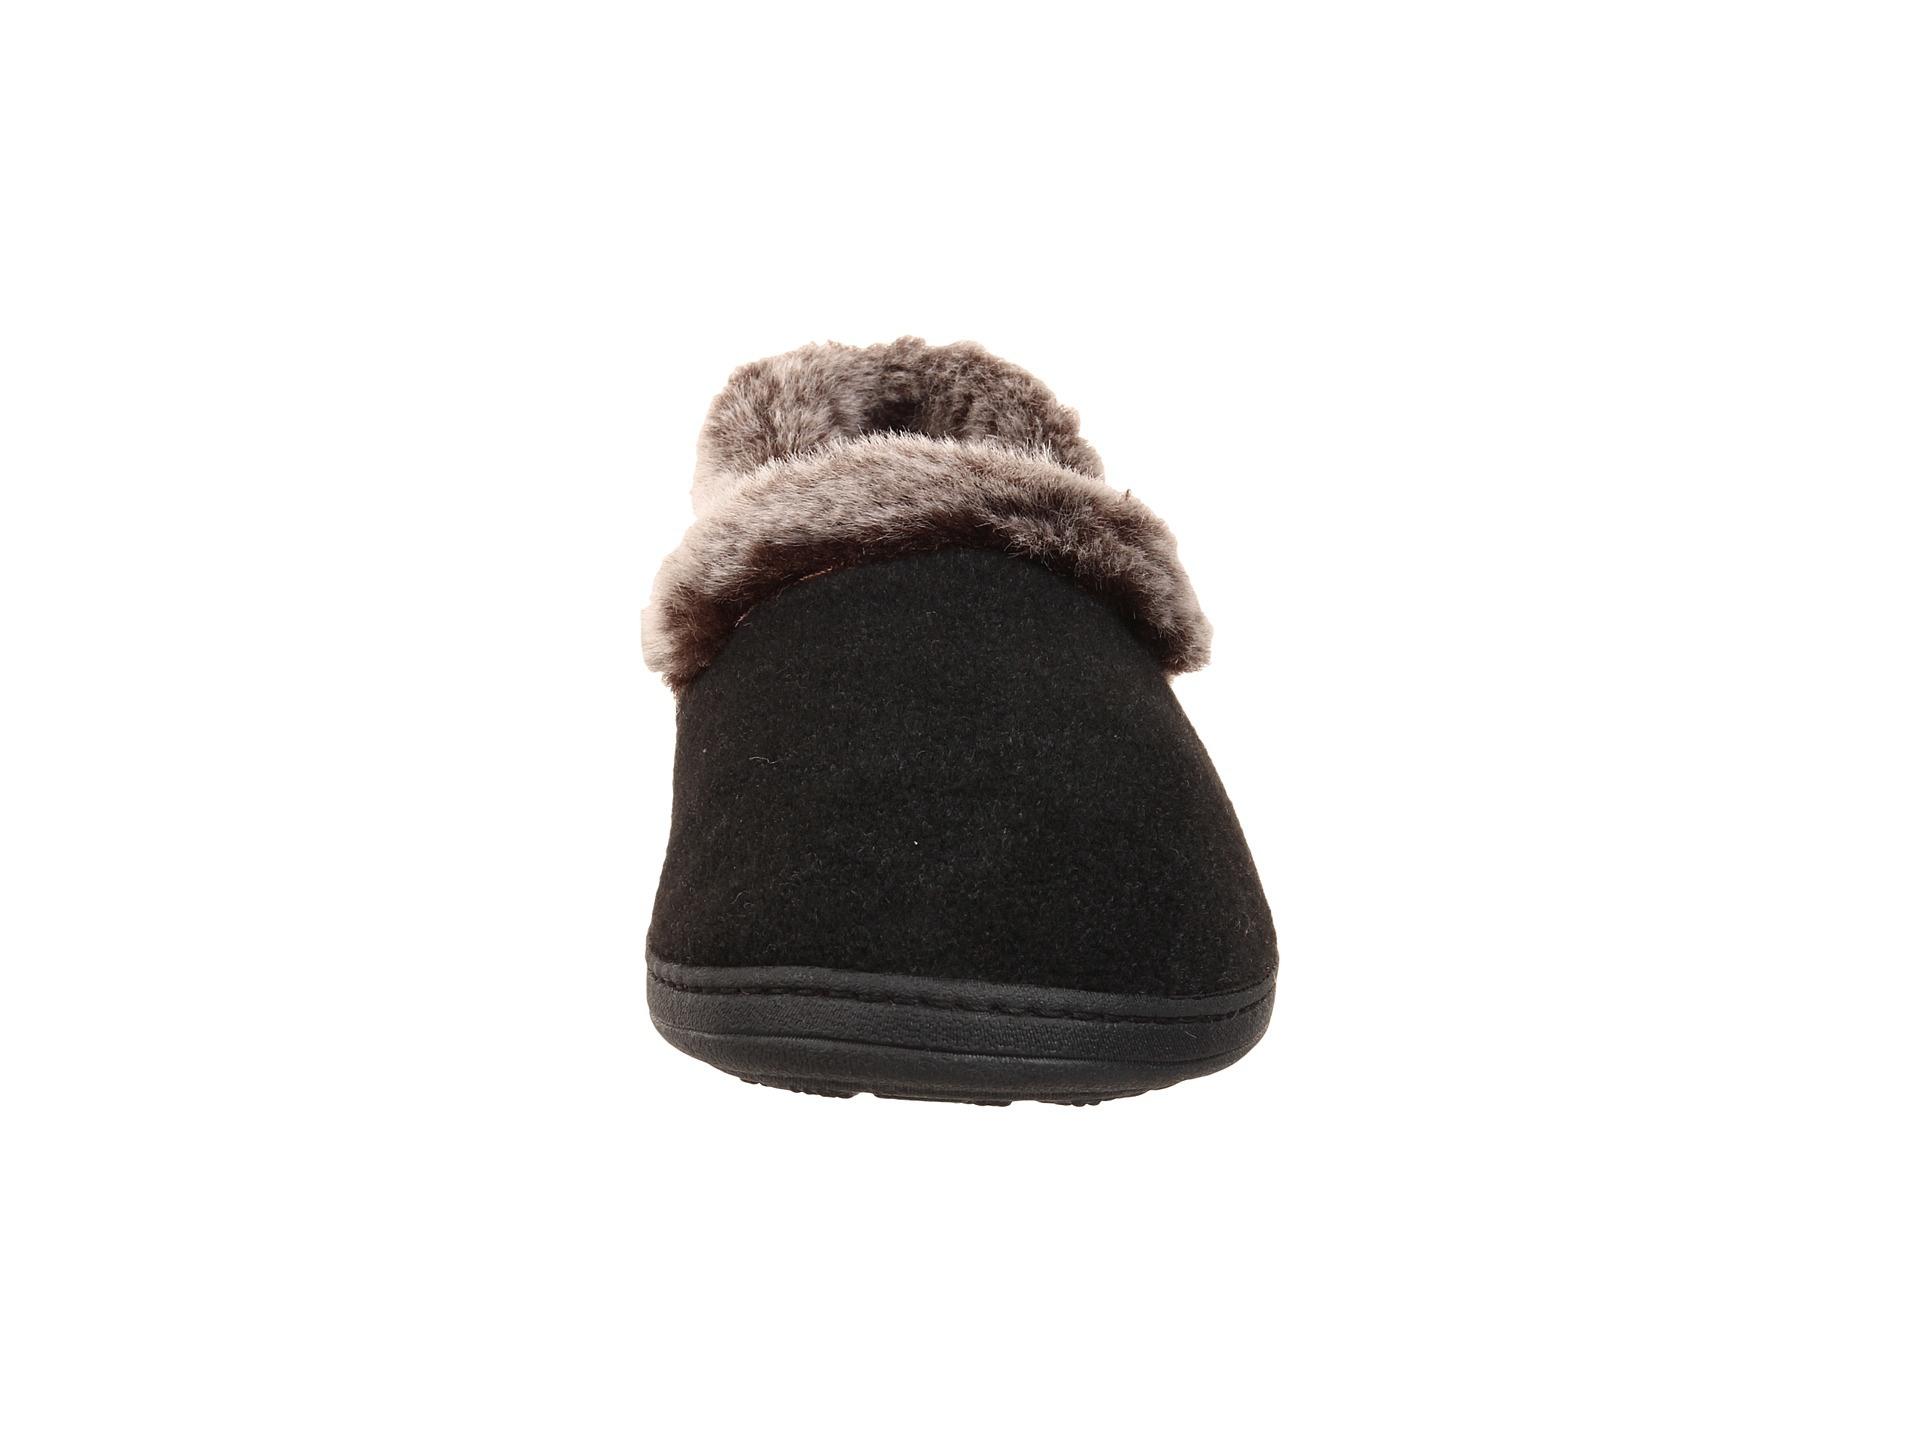 Top Round Fur Warm Memory Foam Slipper